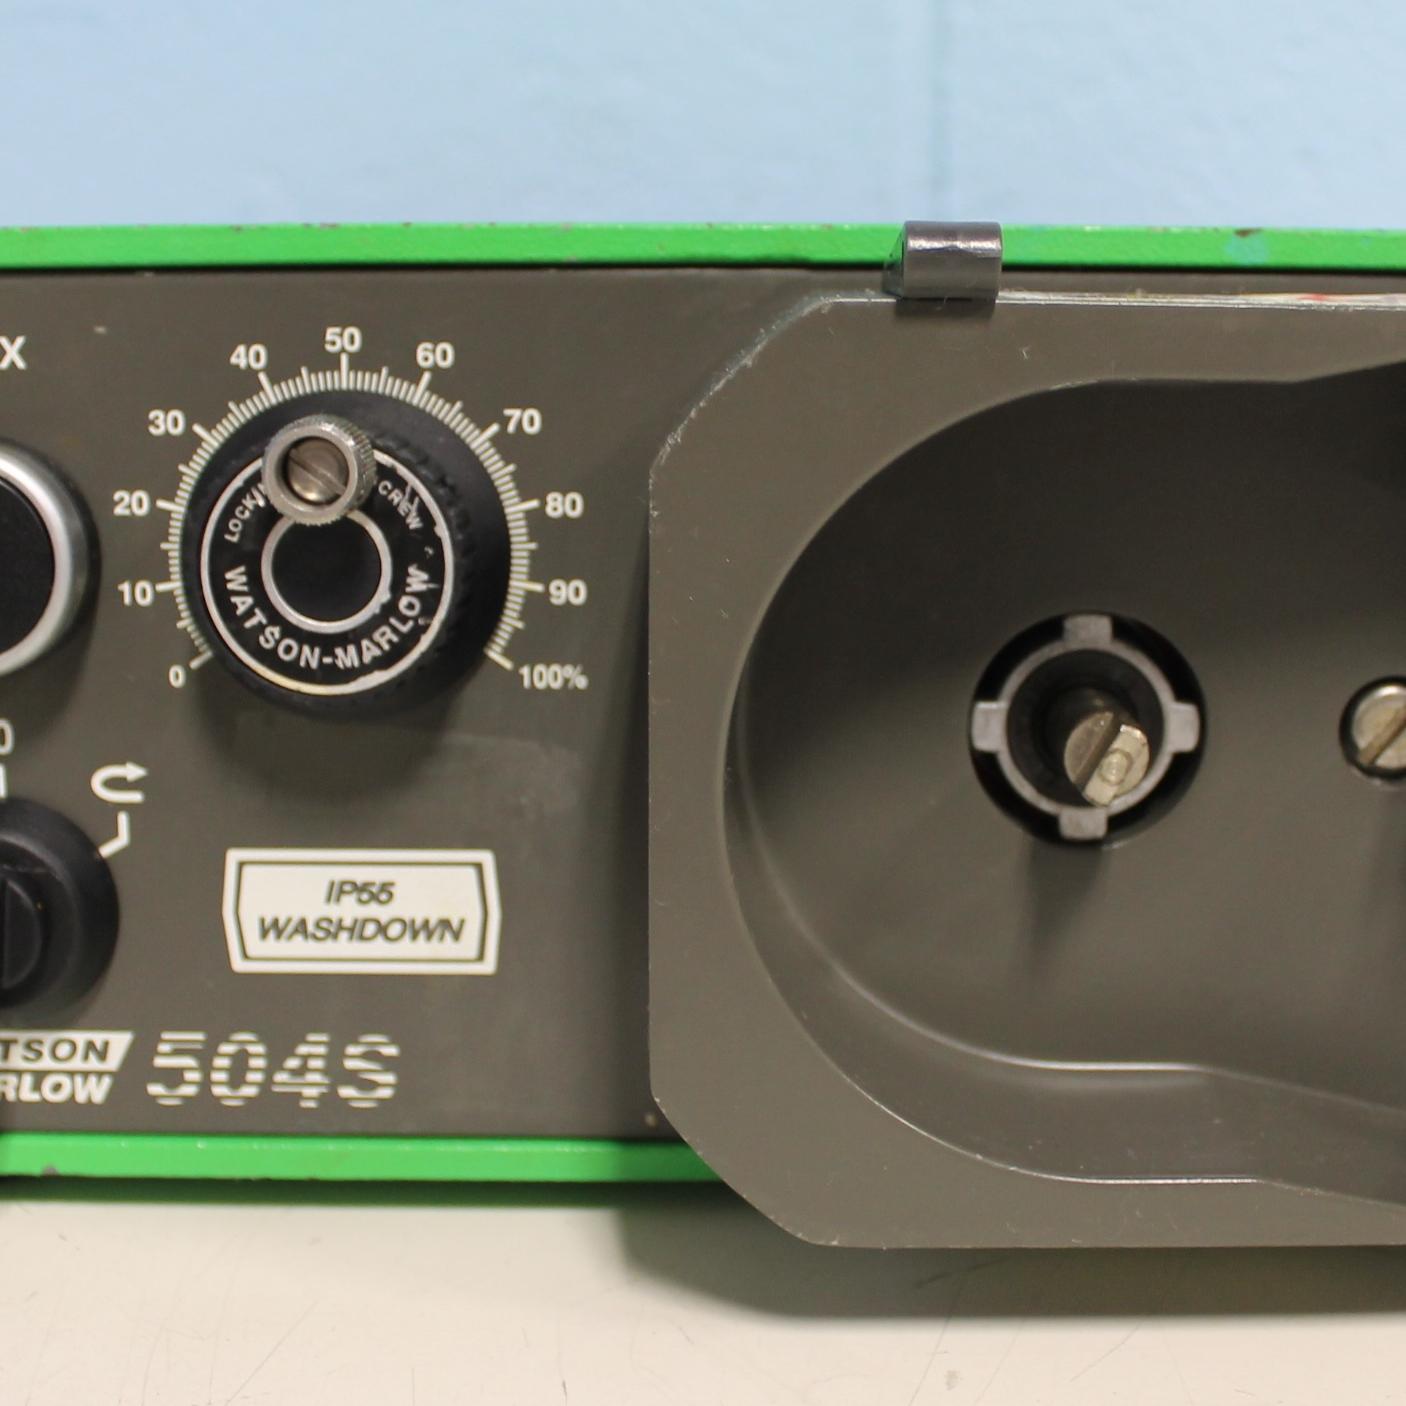 Watson Marlow 504S Peristaltic Pump  Image